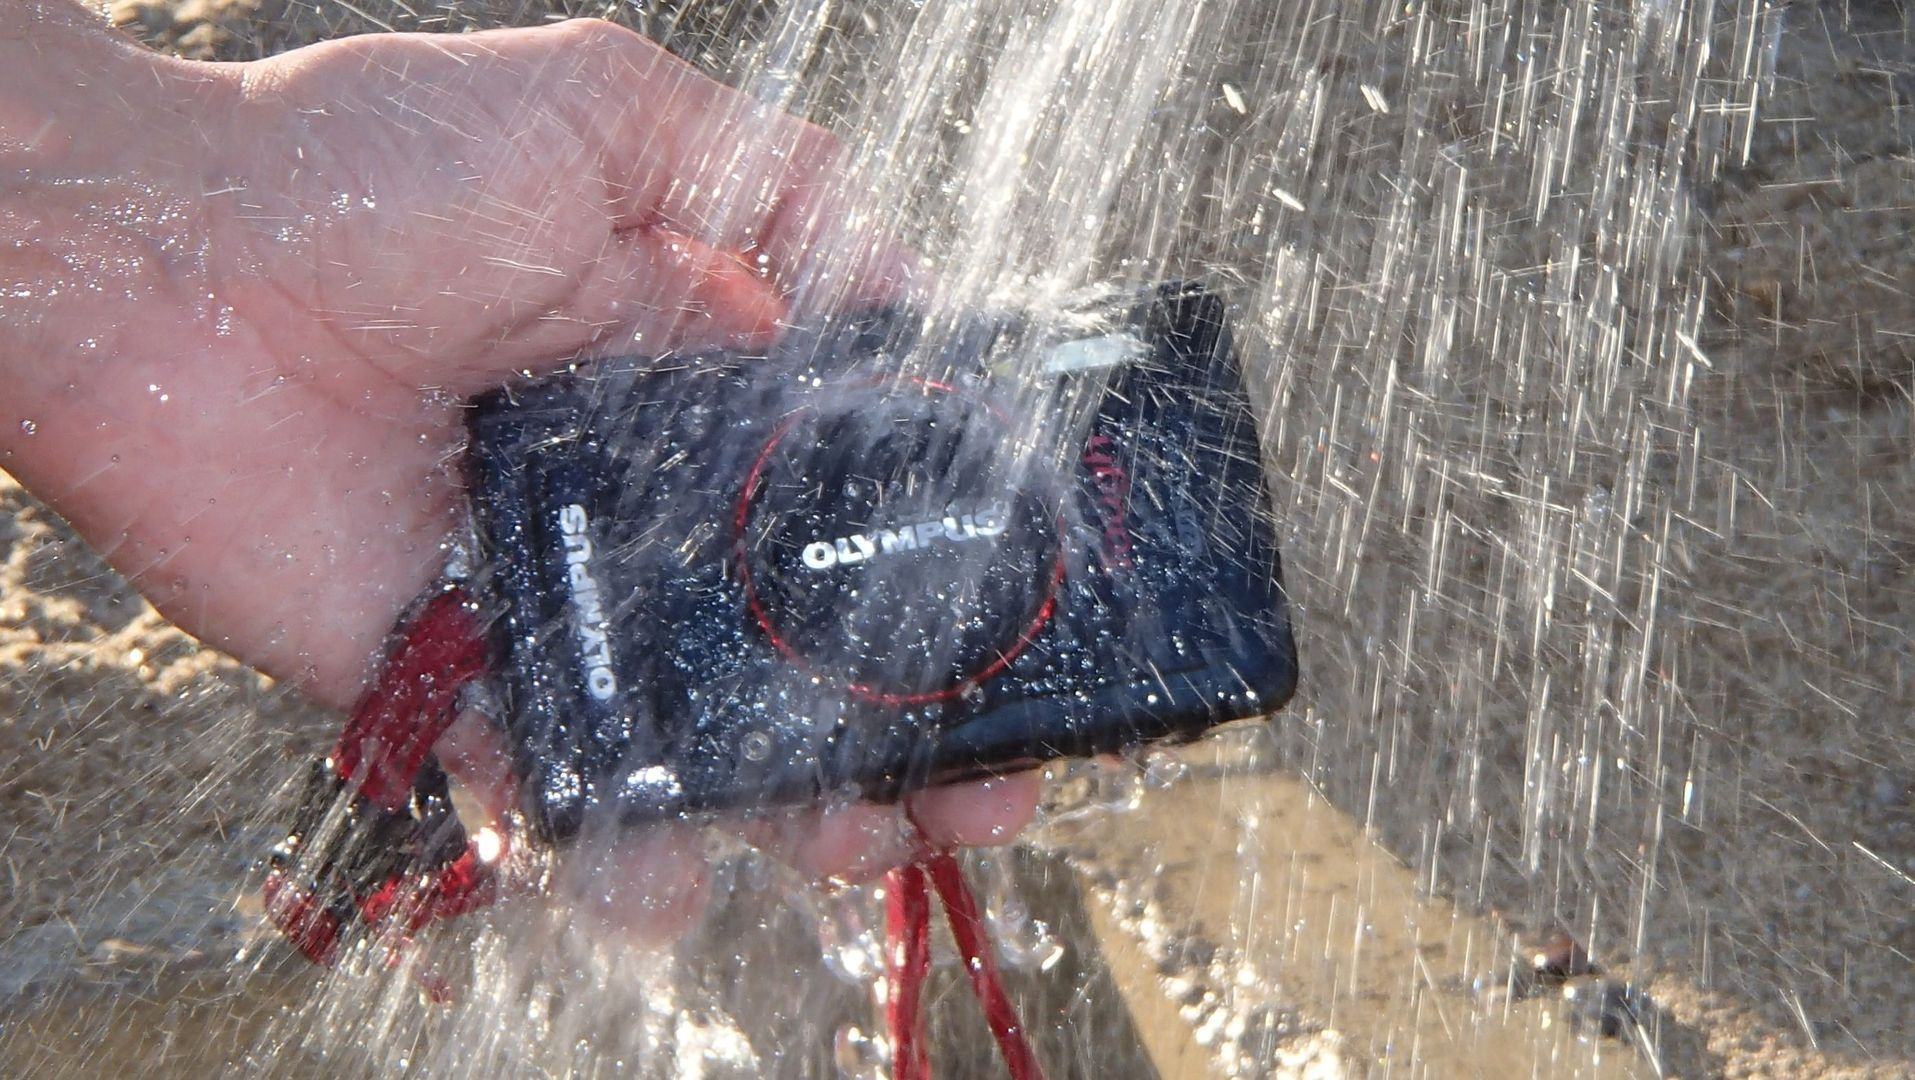 Olympus TG-3 – Robuste Outdoor Kamera, mit echtem Mehrwert im Fun Sektor